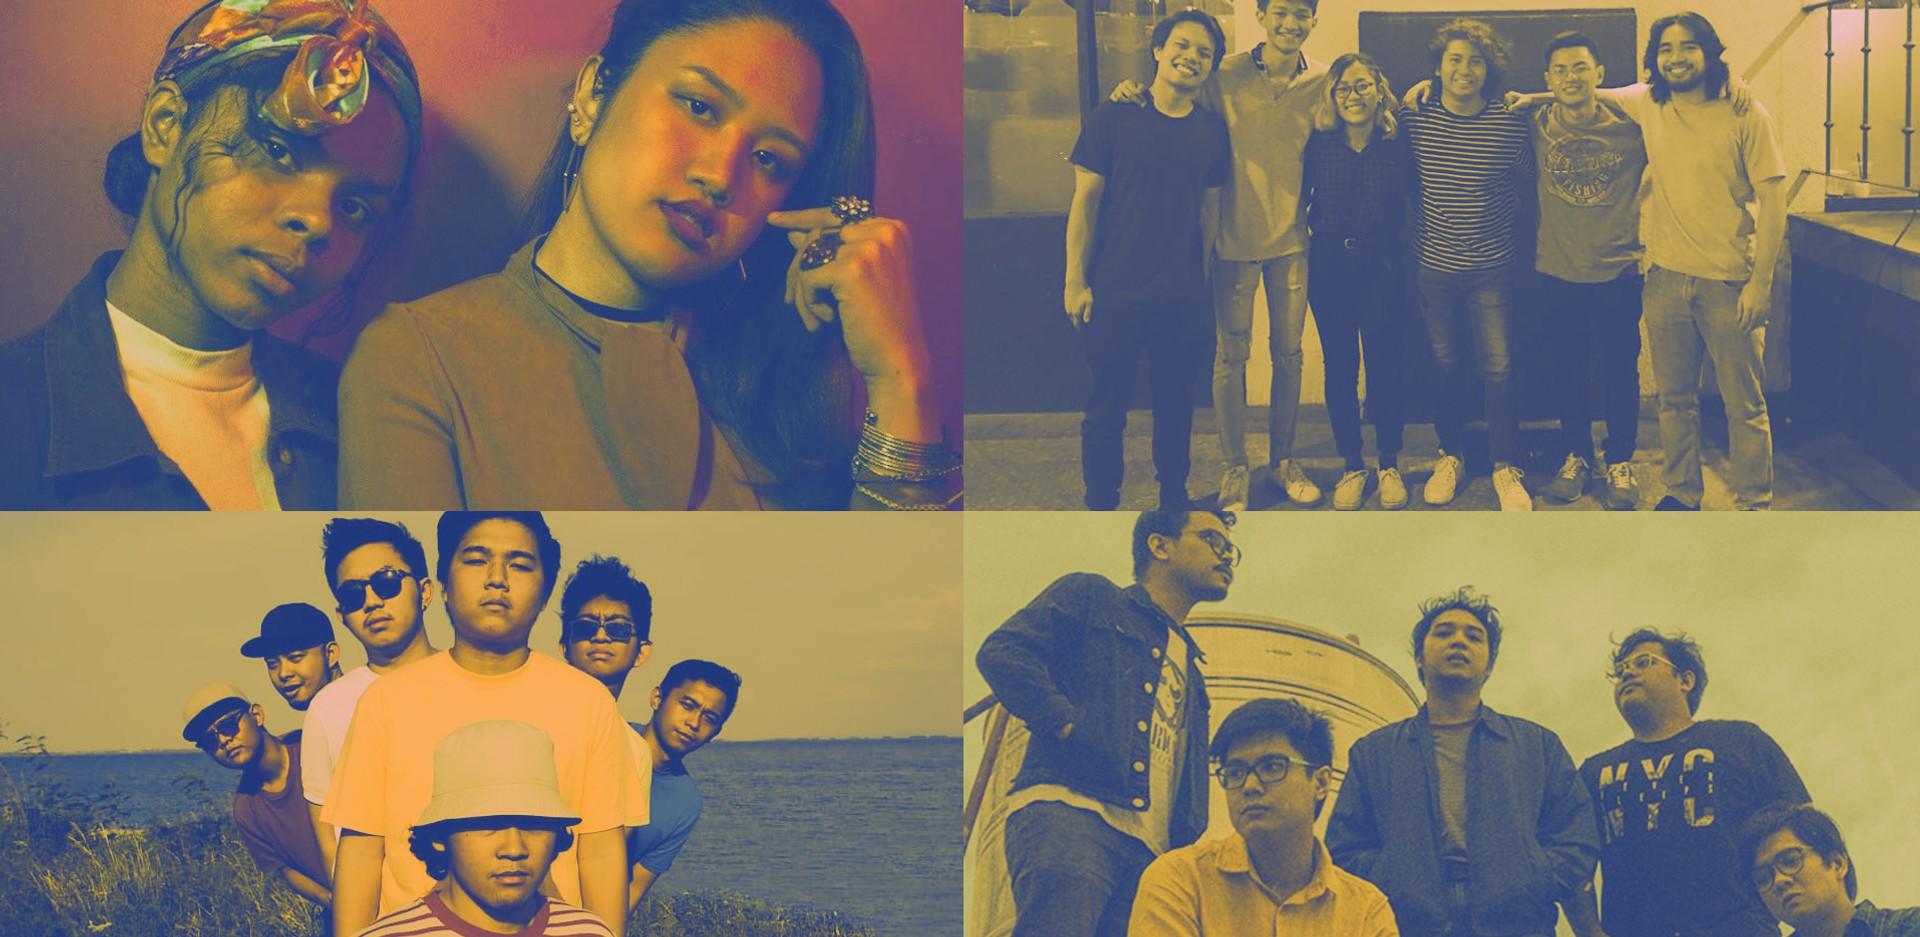 Allen&Elle, Morobe, Sansette, and The Sundown to go head to head at the Wanderbattle Finals in Cebu